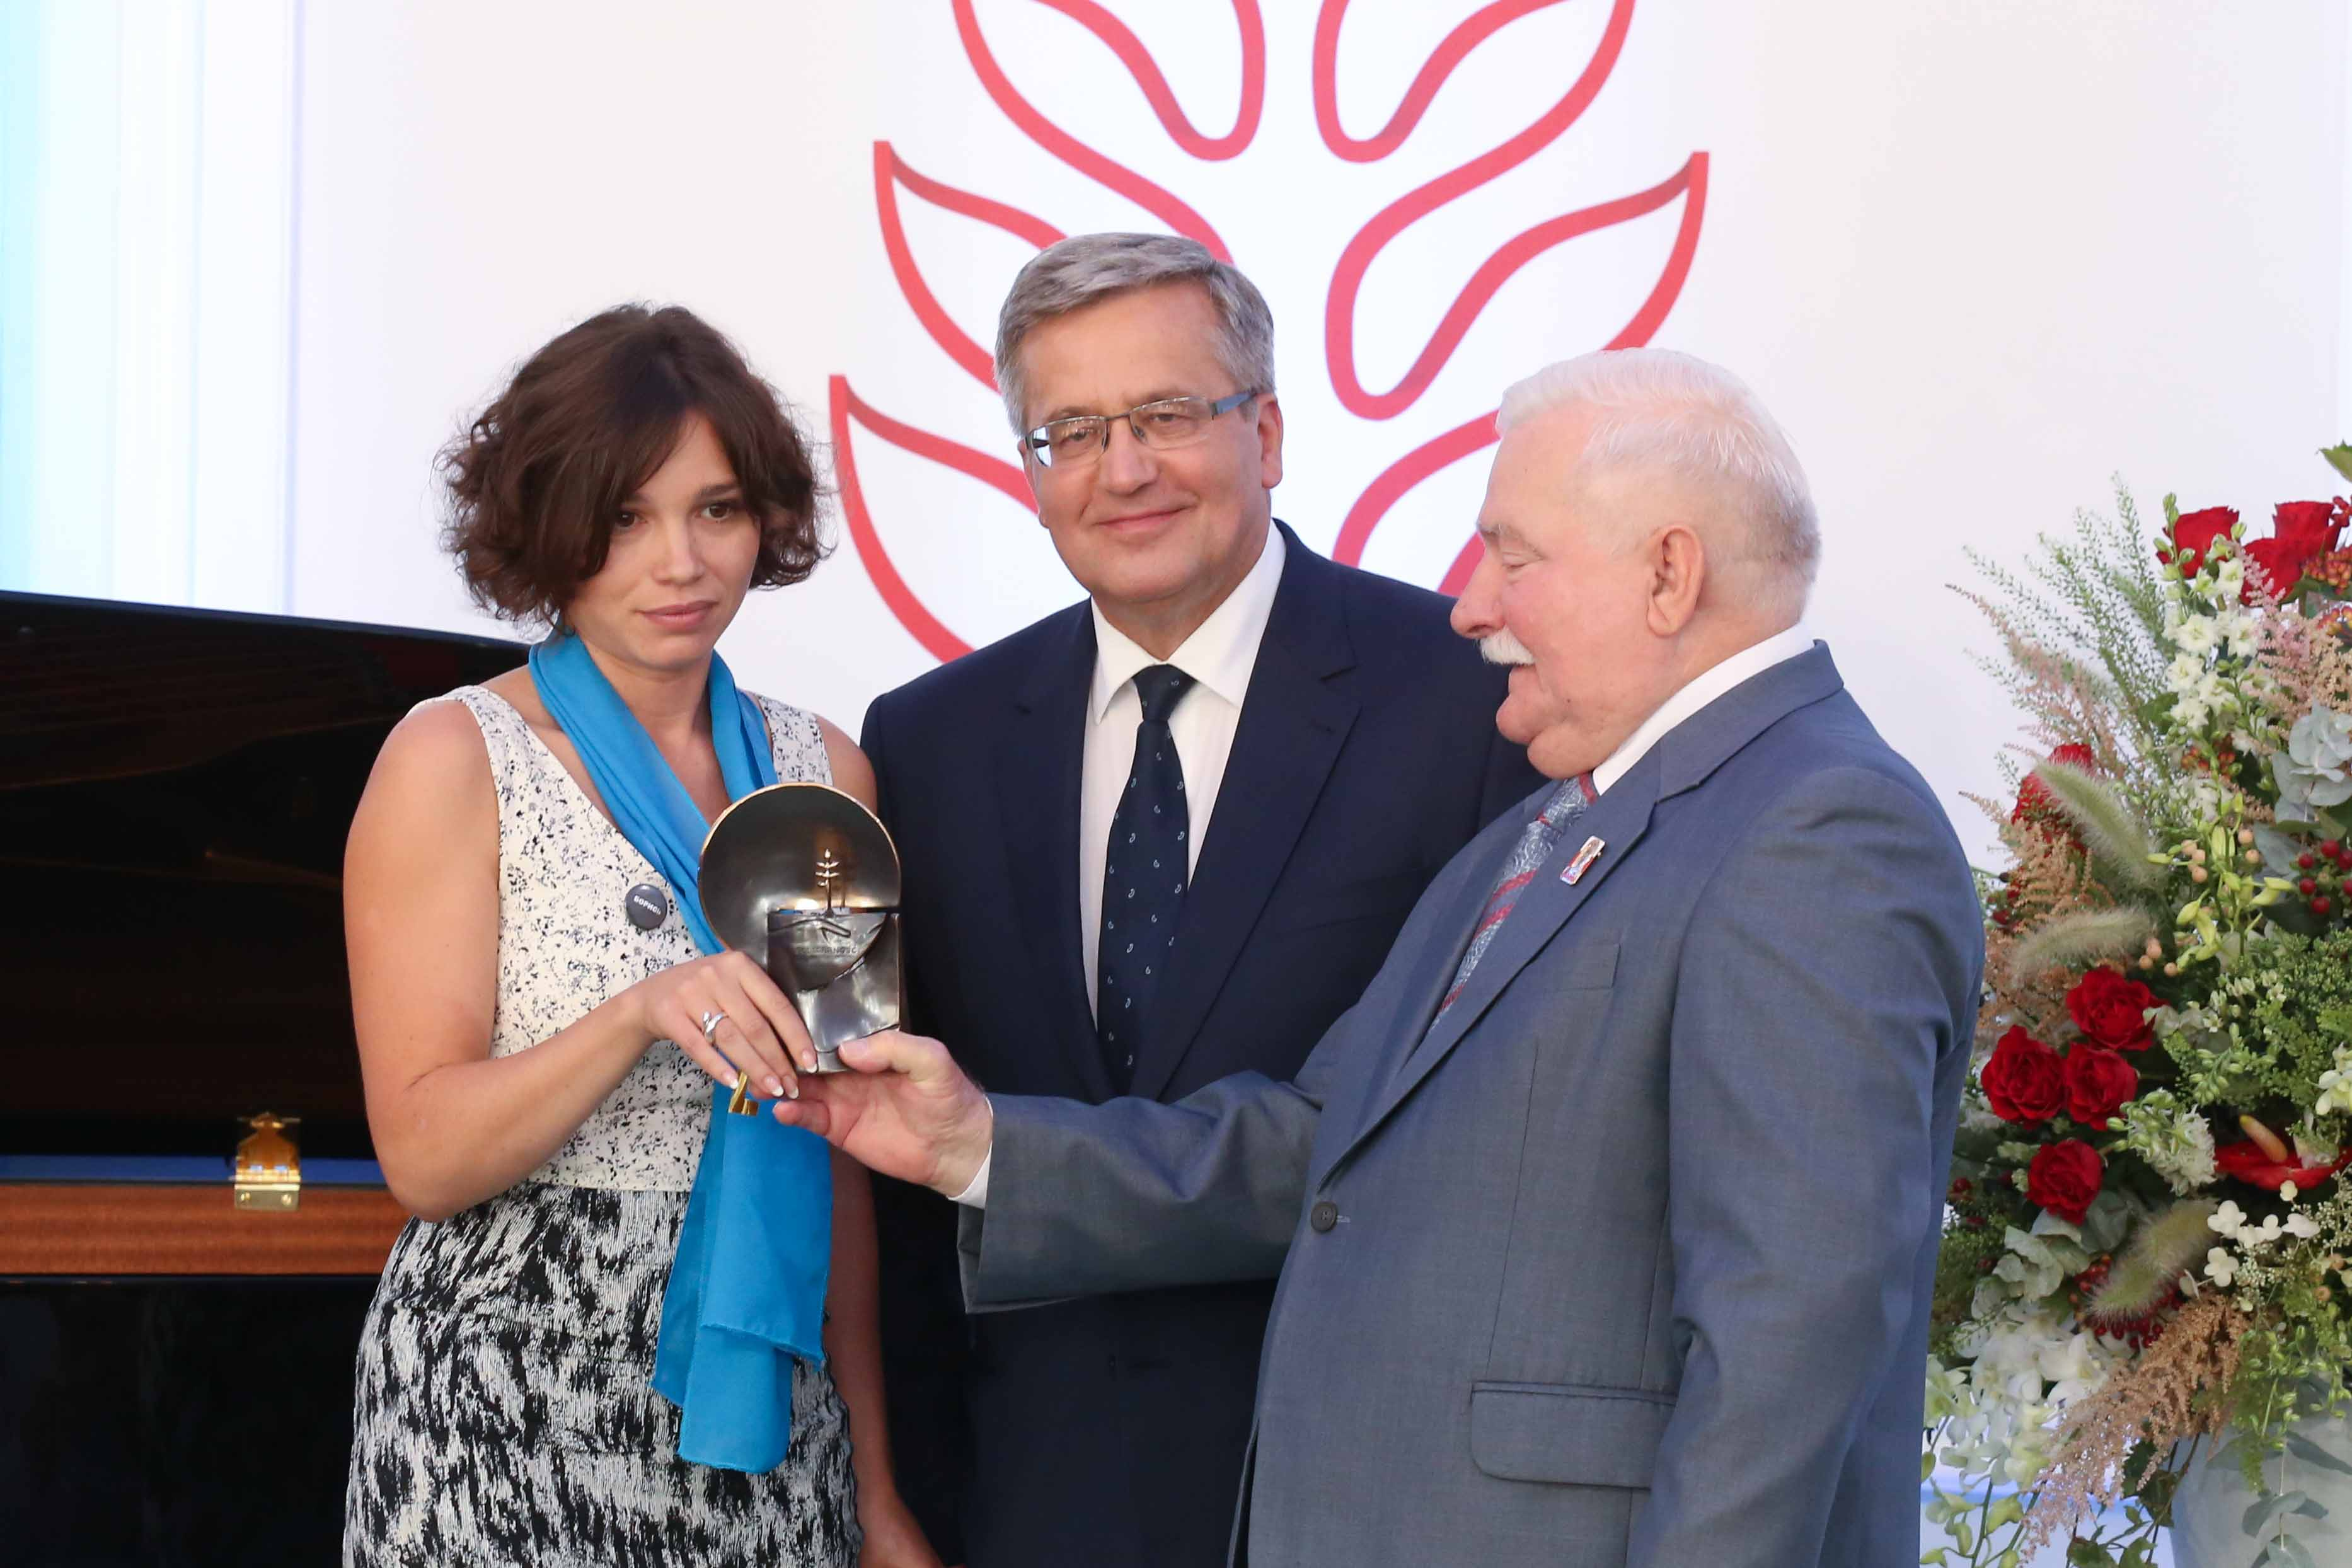 RFE/RL: Boris Nemtsov's Daughter Receives $1.1 Million Rights Prize From Poland